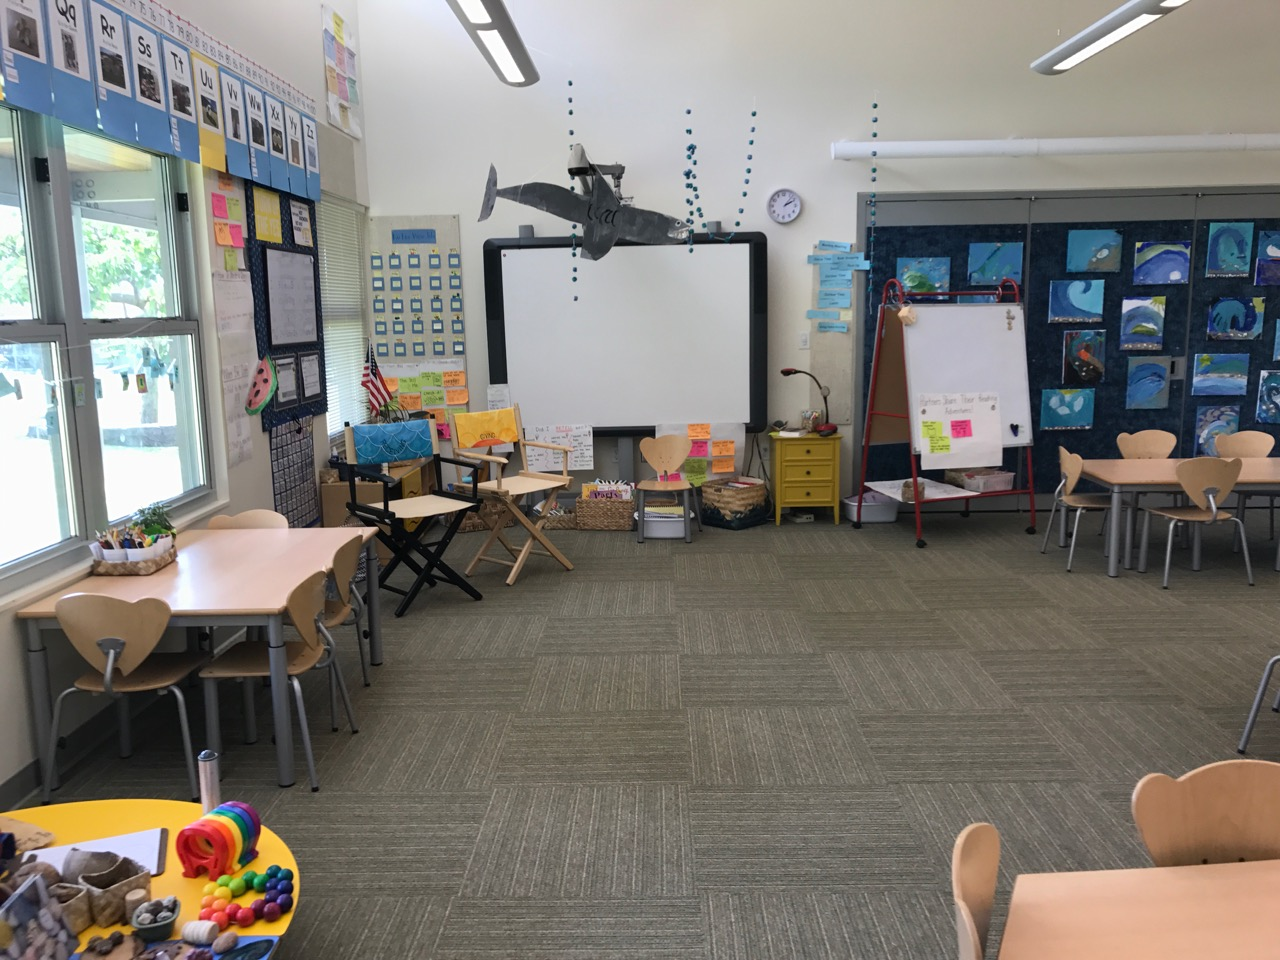 Energy Chairs by Roxanne Darling, installed at Punahou School, Honolulu, Hawaii